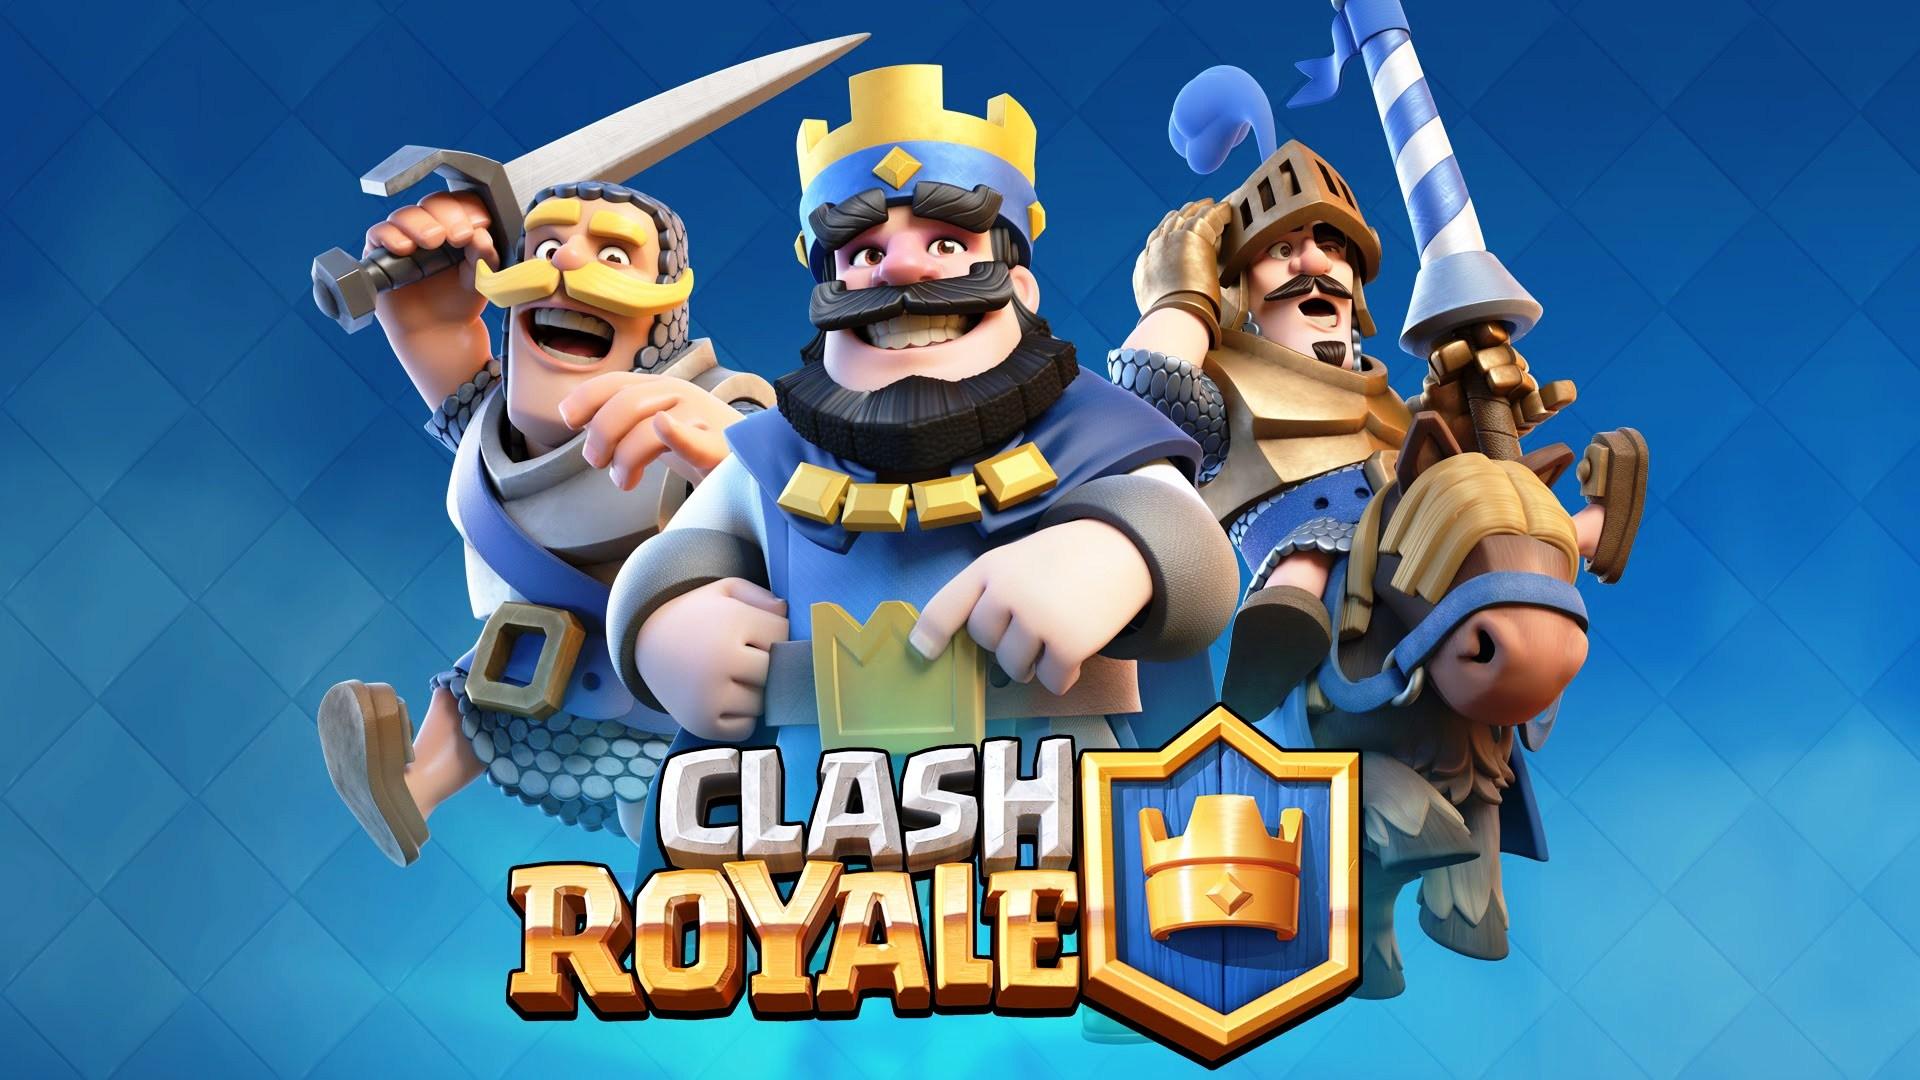 supercell-clash-royale-hd-qhd